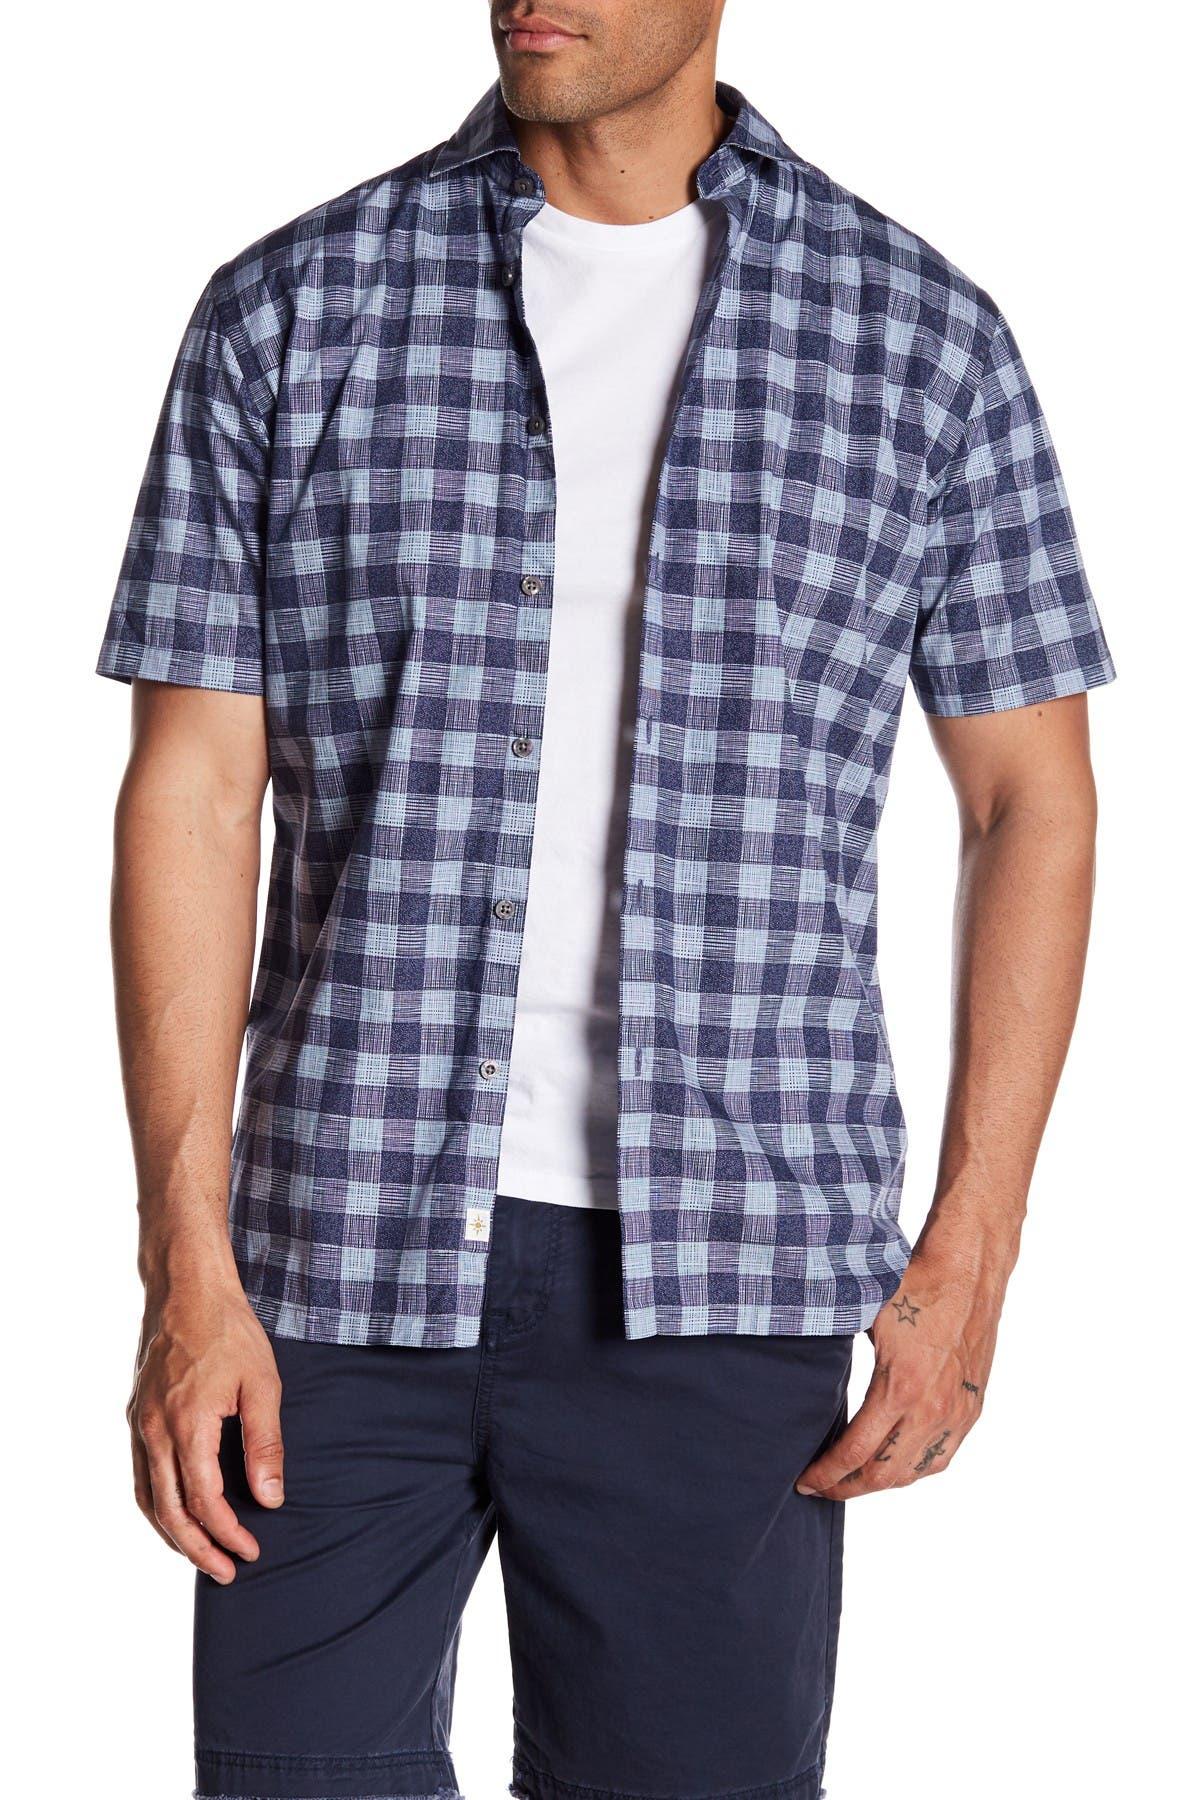 Image of COASTAORO Cabello Check Print Slim Fit Shirt